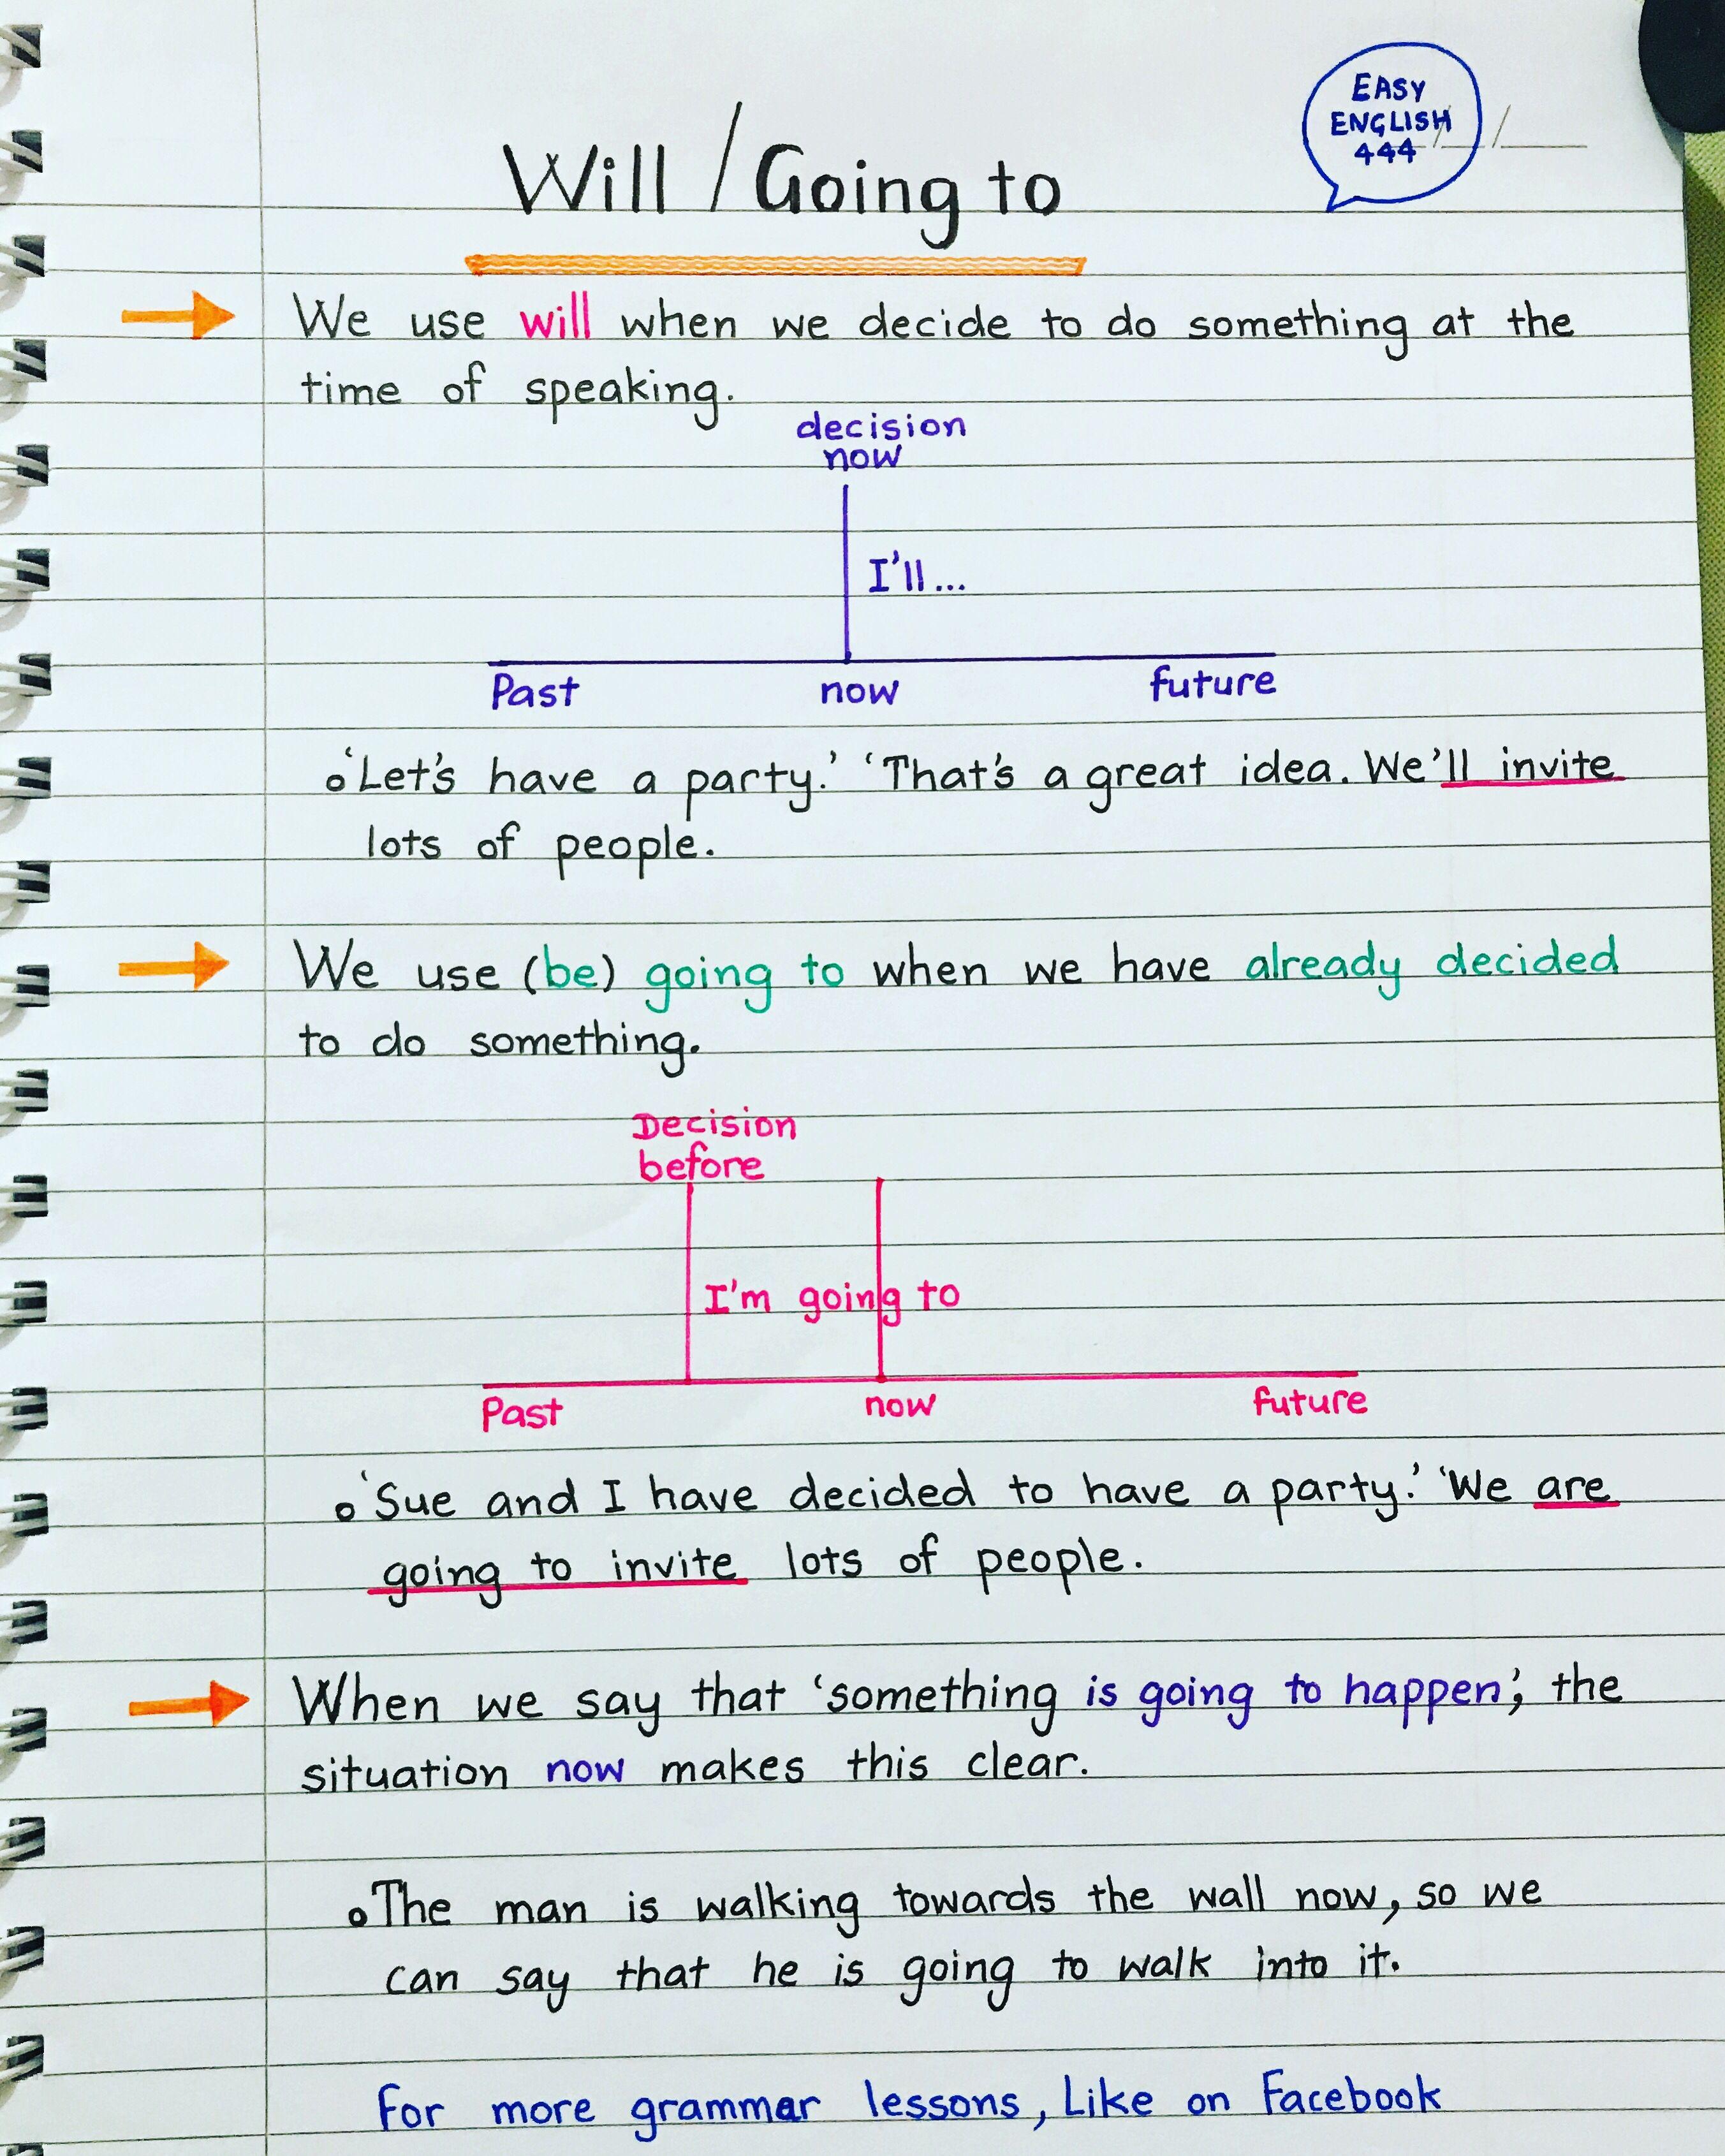 English Language Learn English Grammar English Language Learning Grammar Learn English Vocabulary [ 3381 x 2705 Pixel ]